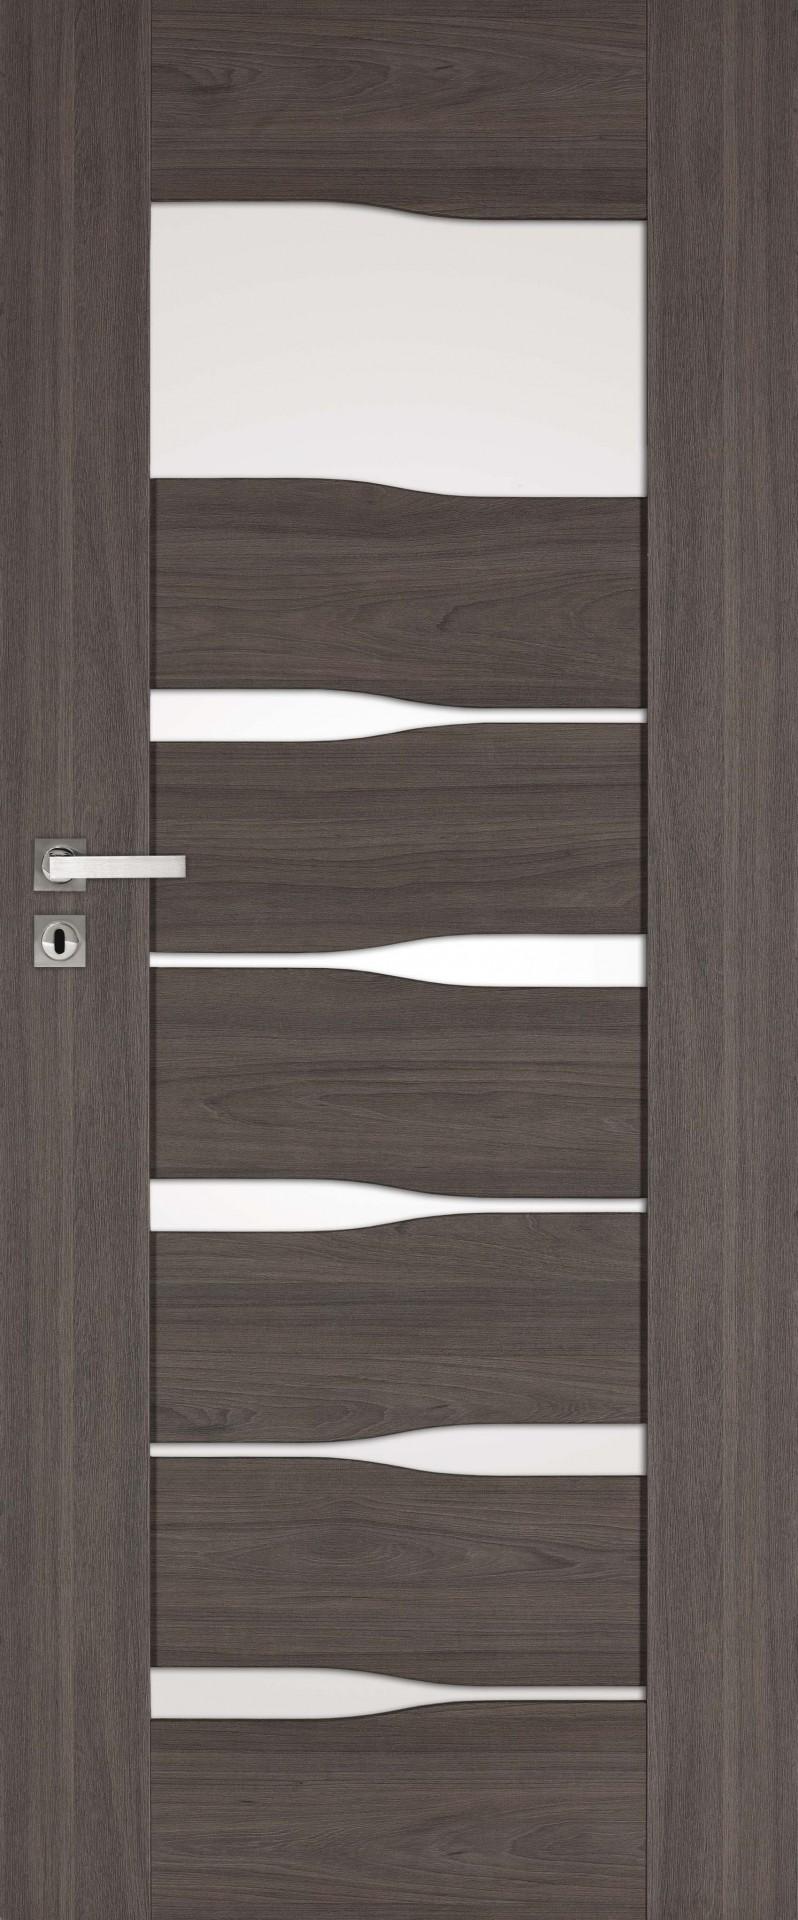 Dre dveře EMENA 1